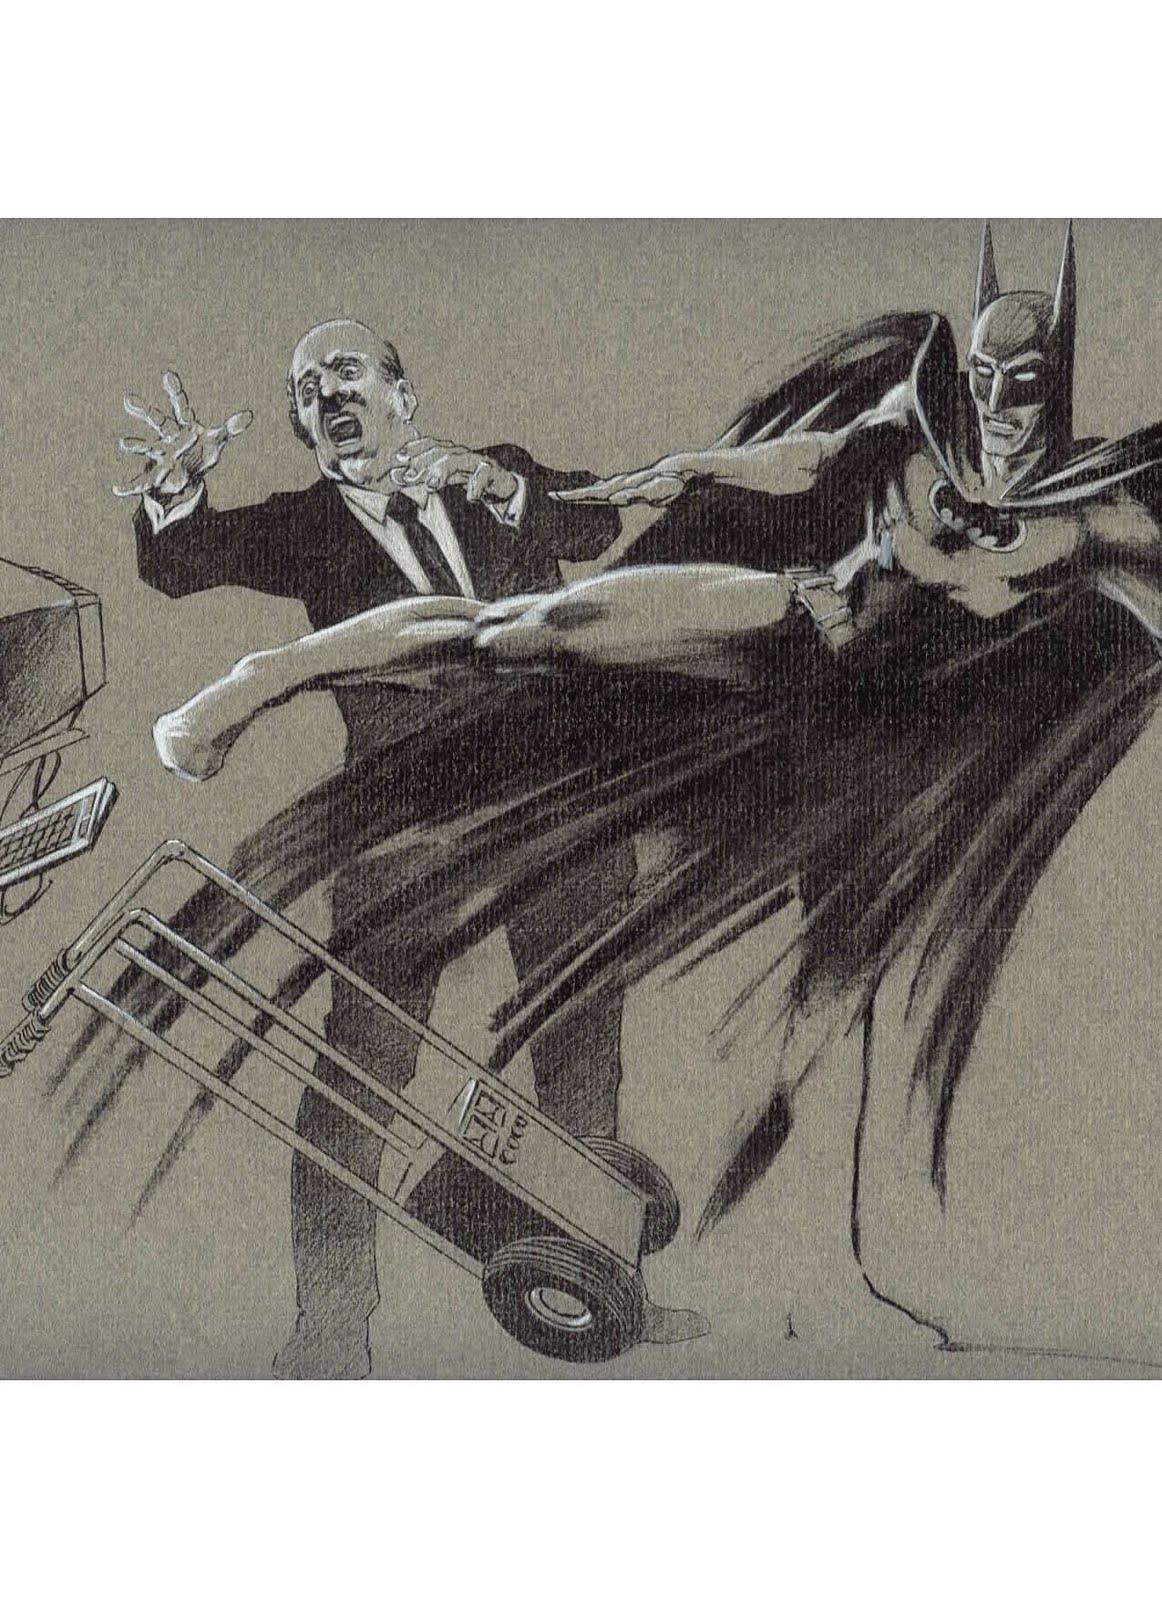 [Bats-Grell]